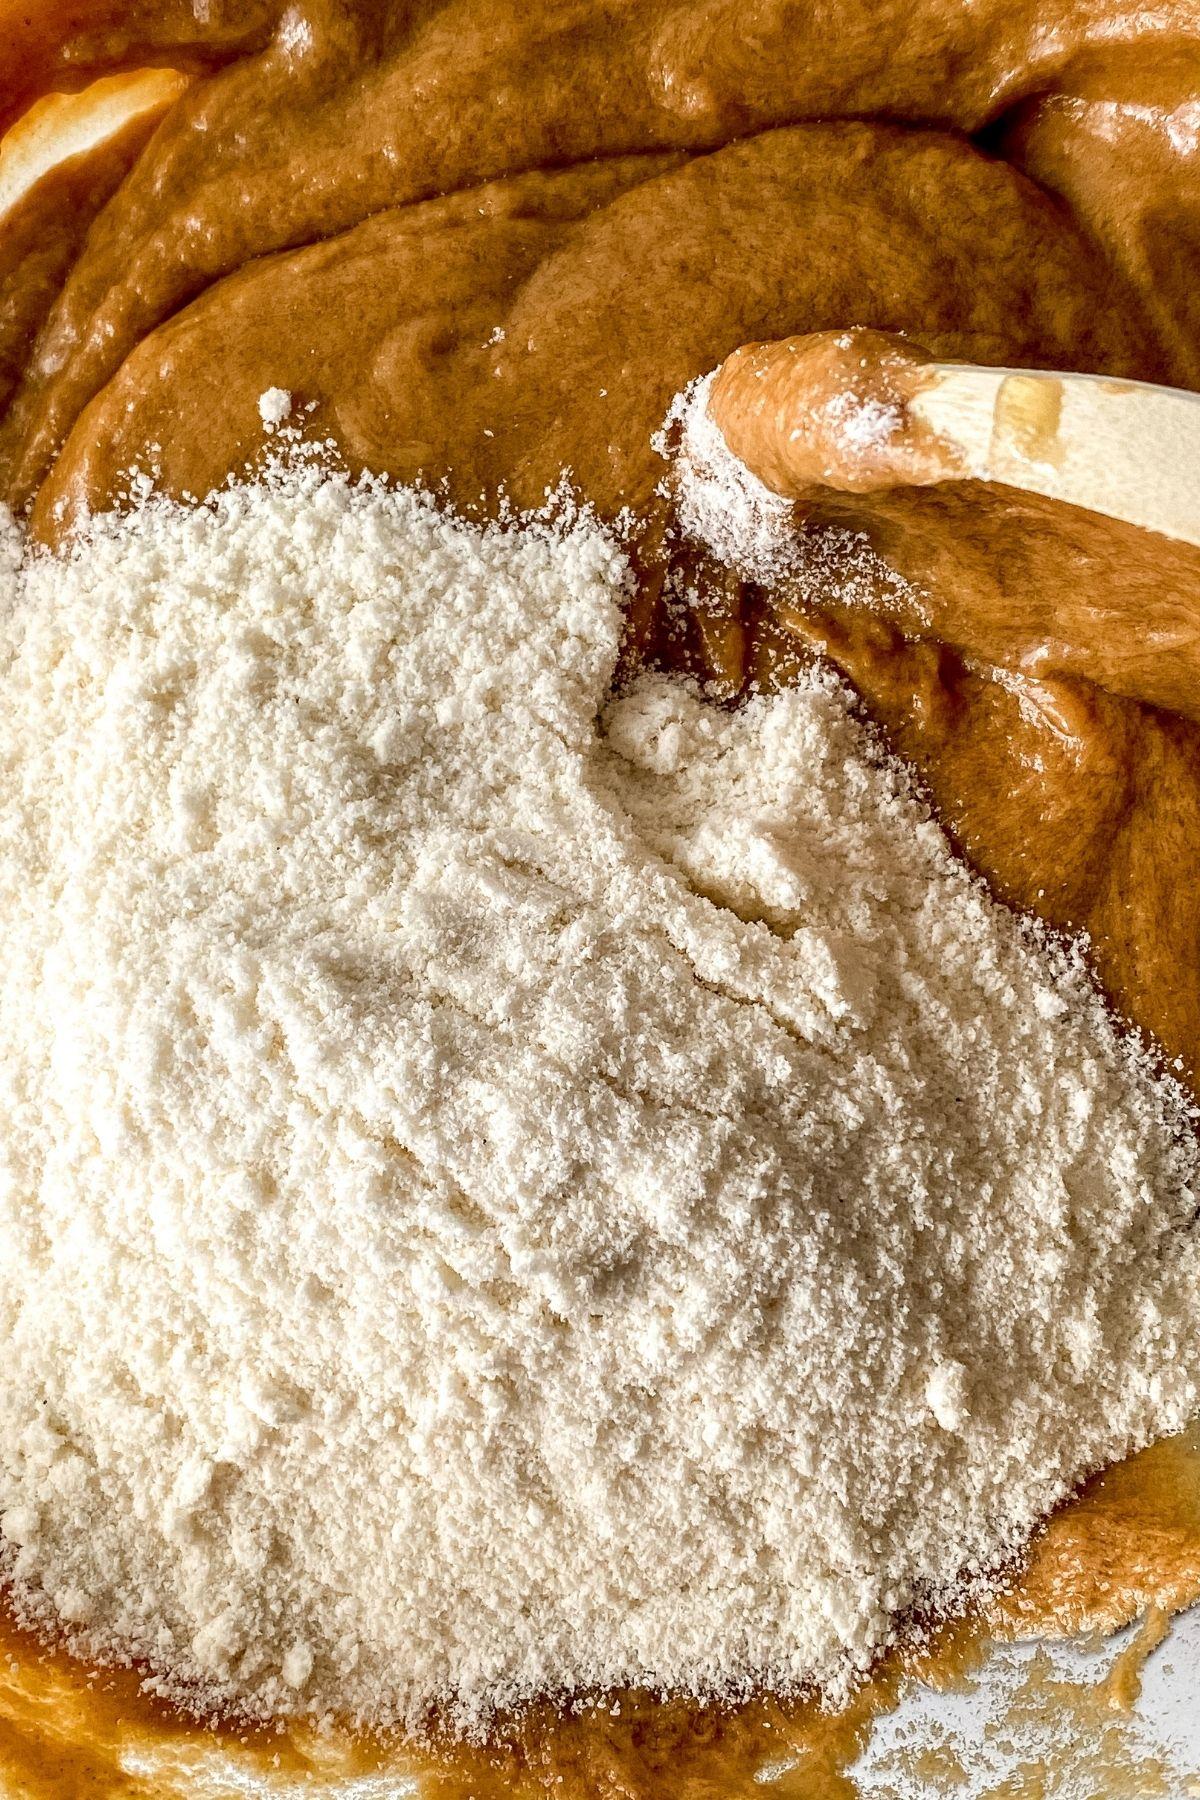 Mixing peanut butter ball filling